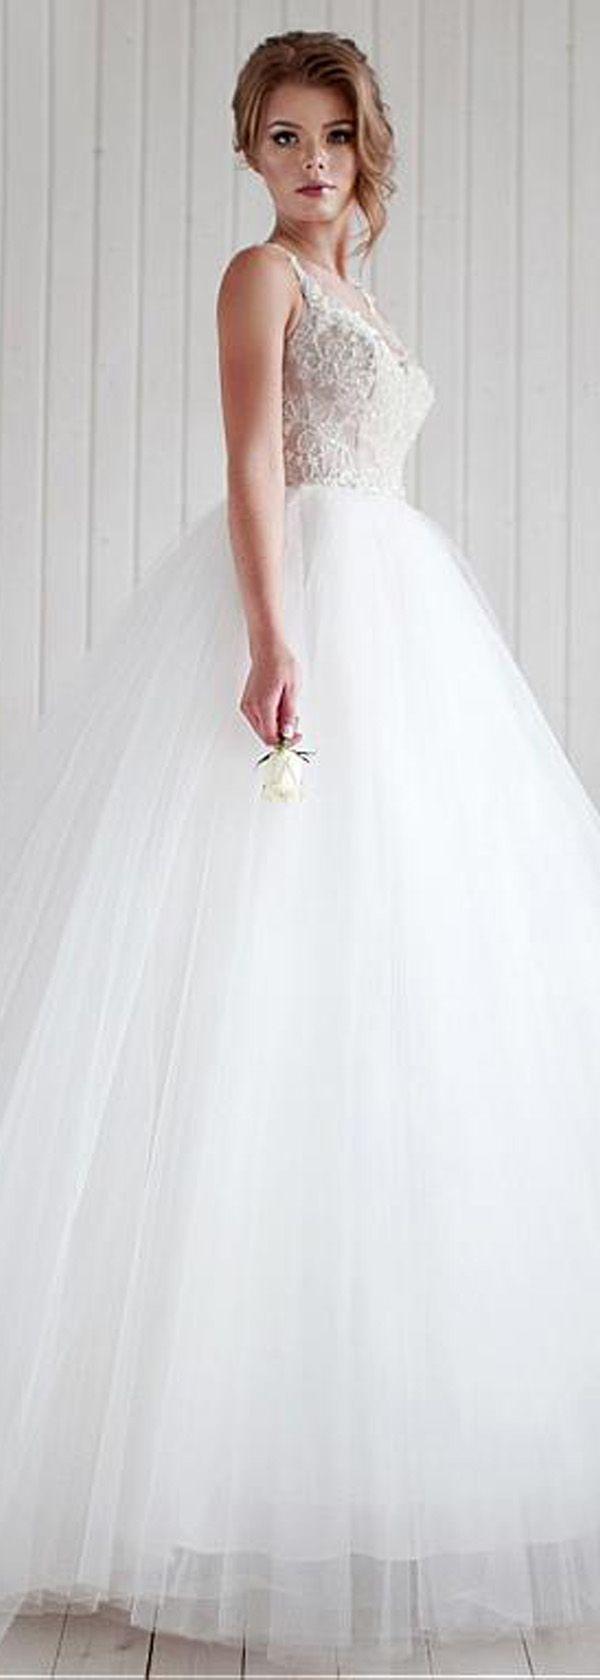 Beaded spaghetti strap wedding dresses  Elegant Tulle Spaghetti Straps Neckline Ball Gown Wedding Dress With